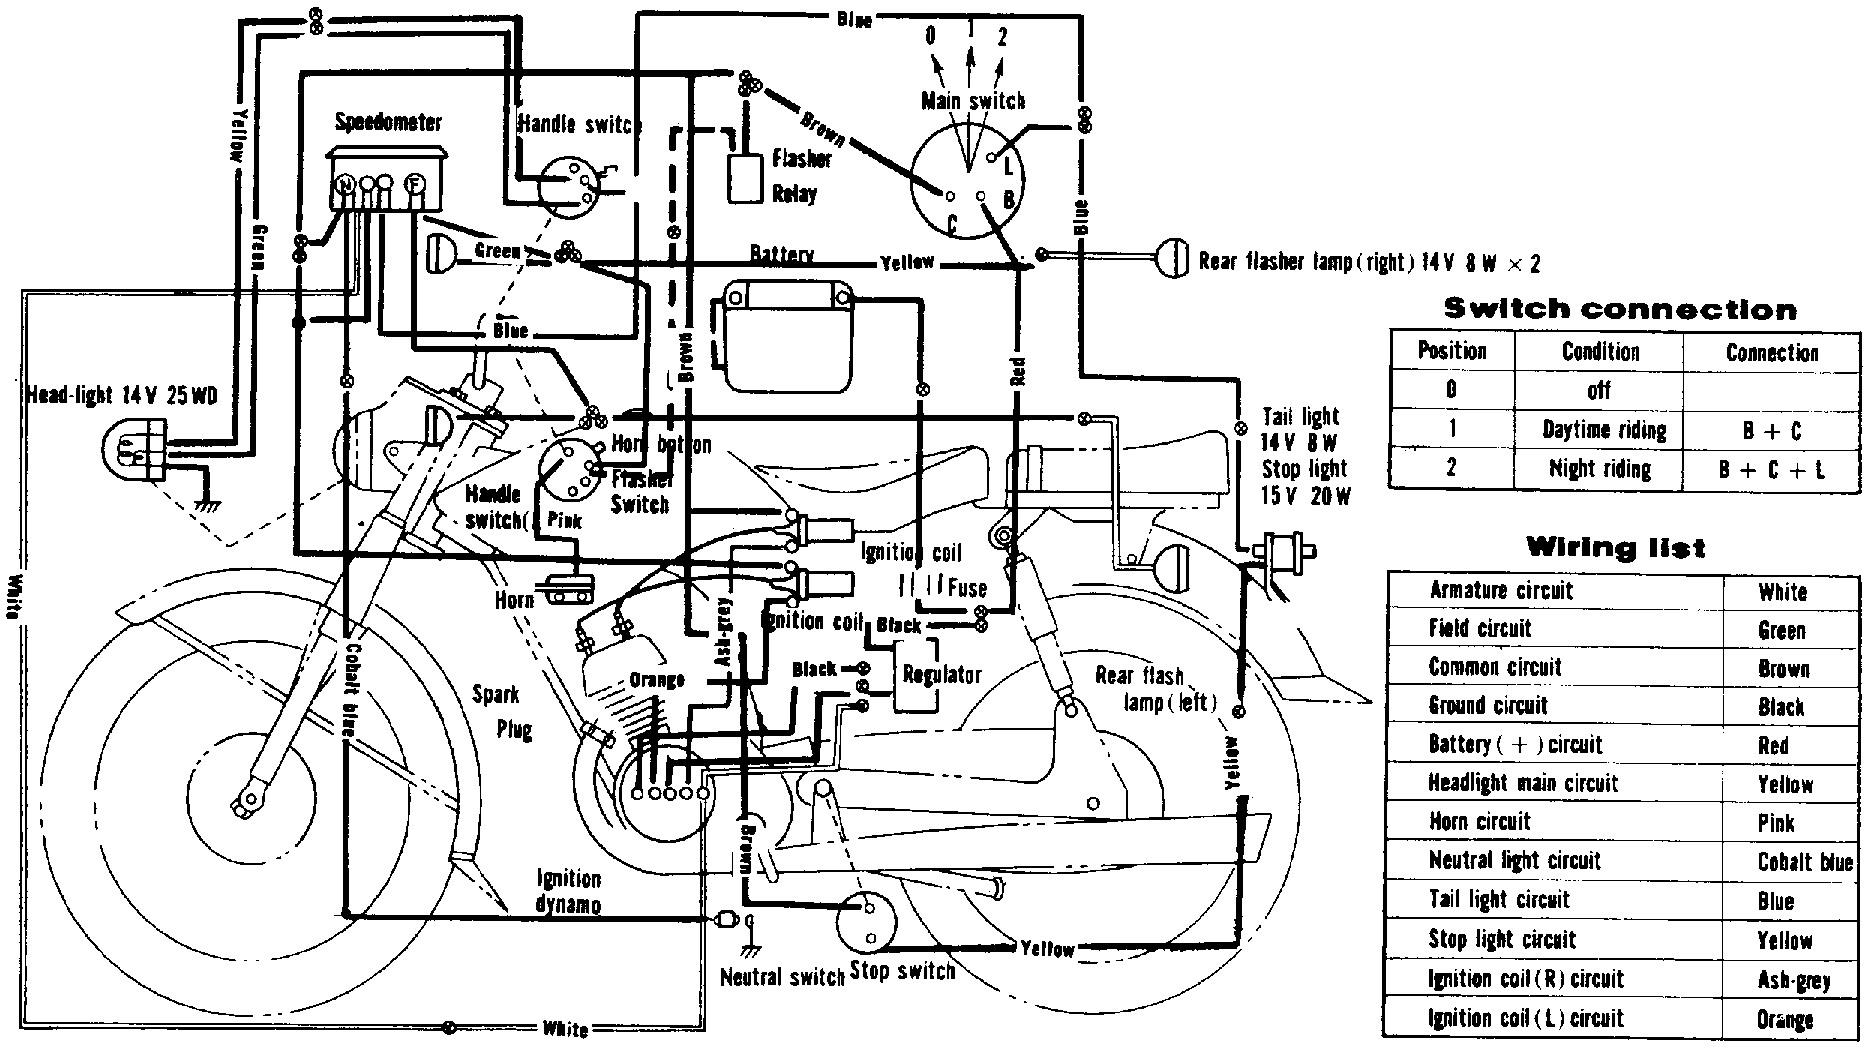 medium resolution of yamaha l2 wiring diagram wiring diagram portal yamaha rectifier regulator wiring diagram yamaha l2 wiring diagram